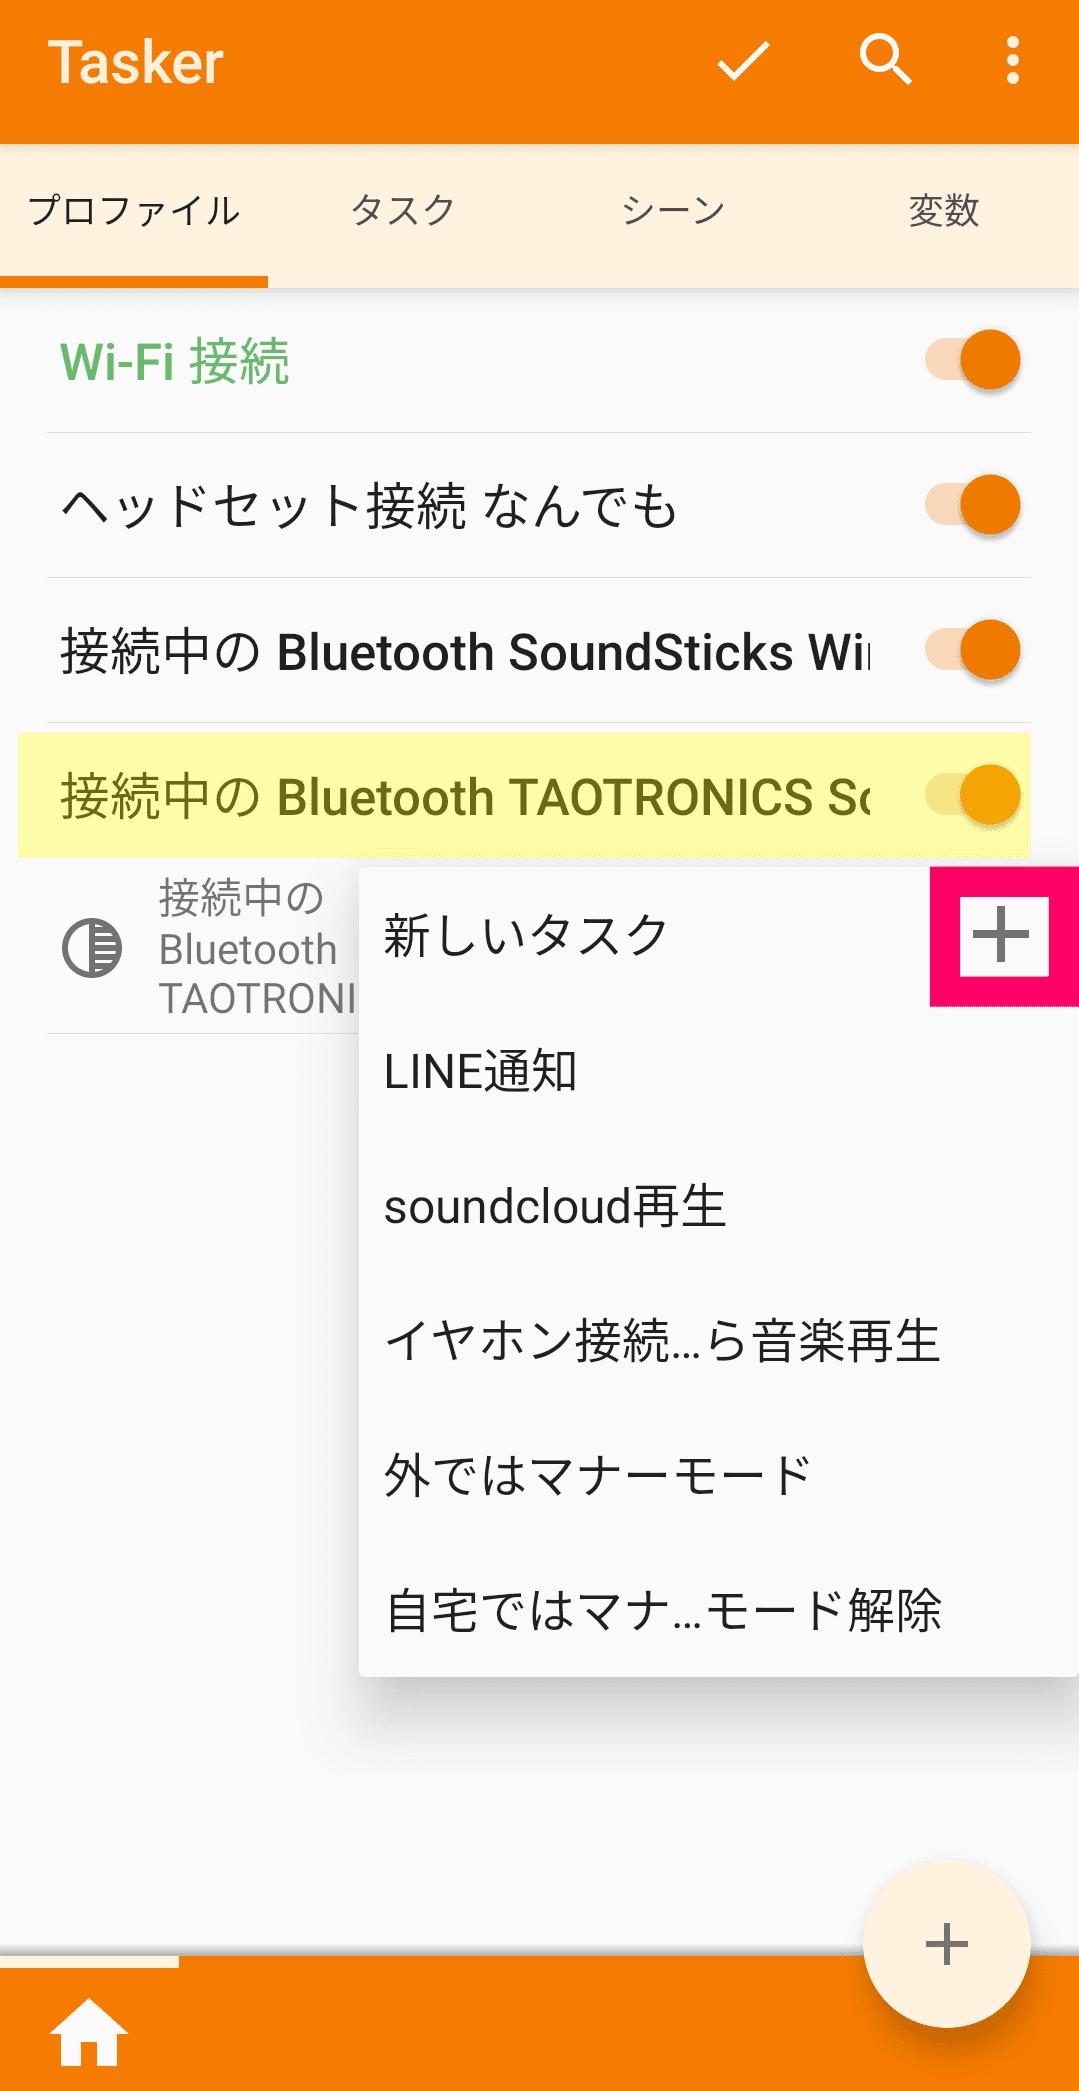 Bluethoothイヤホンに接続したらTaskerアプリで音楽を自動再生させる設定方法